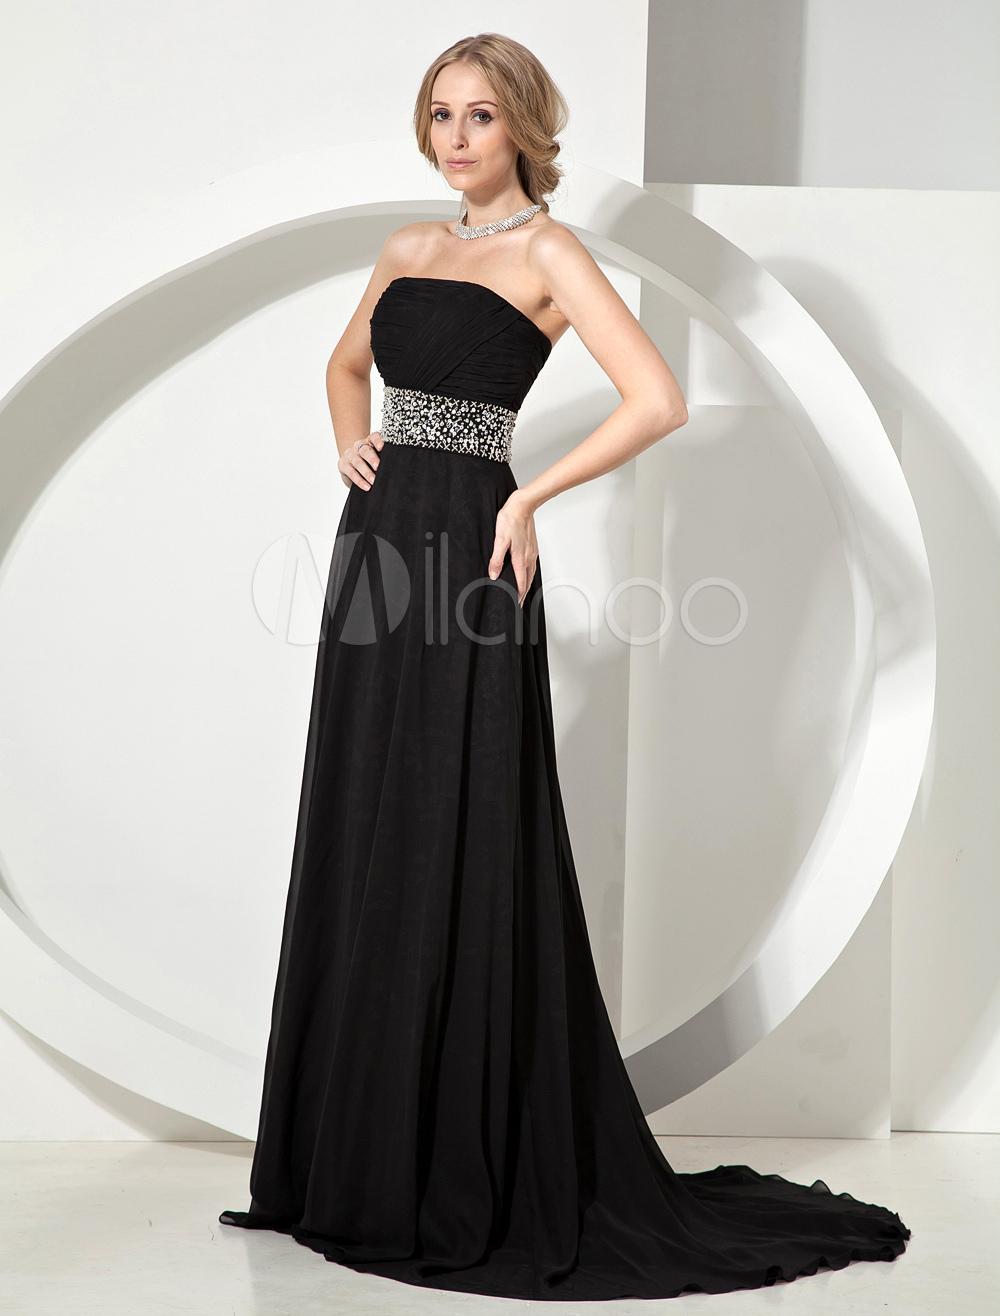 Elegant Black Beading Strapless Chiffon Woman's Evening Dress (Wedding Evening Dresses) photo